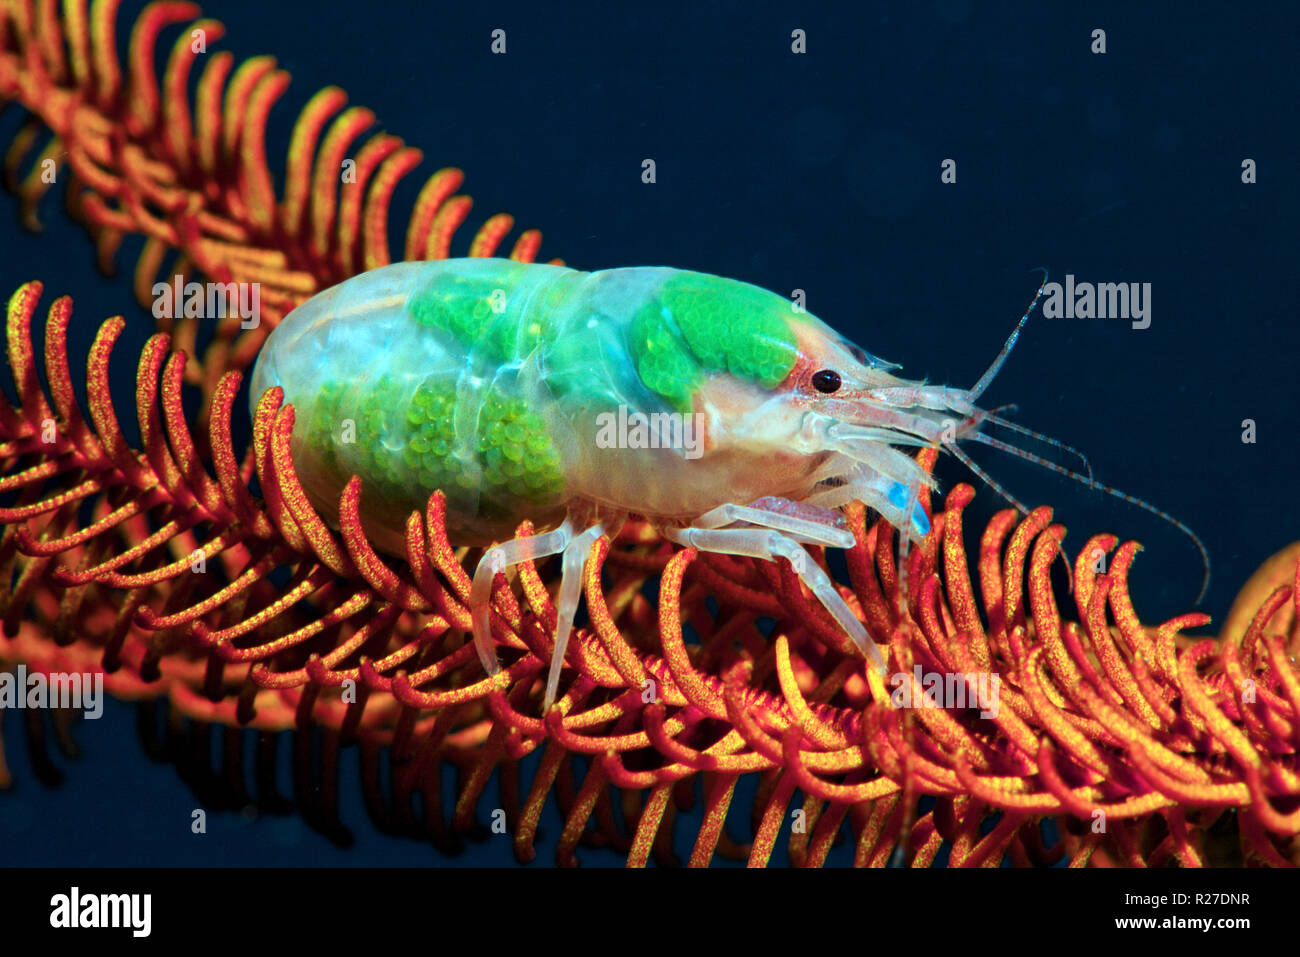 Carinate snapping Shrimp (Synalpheus carinatus) mit Eier auf einem haarstern, Walindi Papua-Neuguinea Stockbild